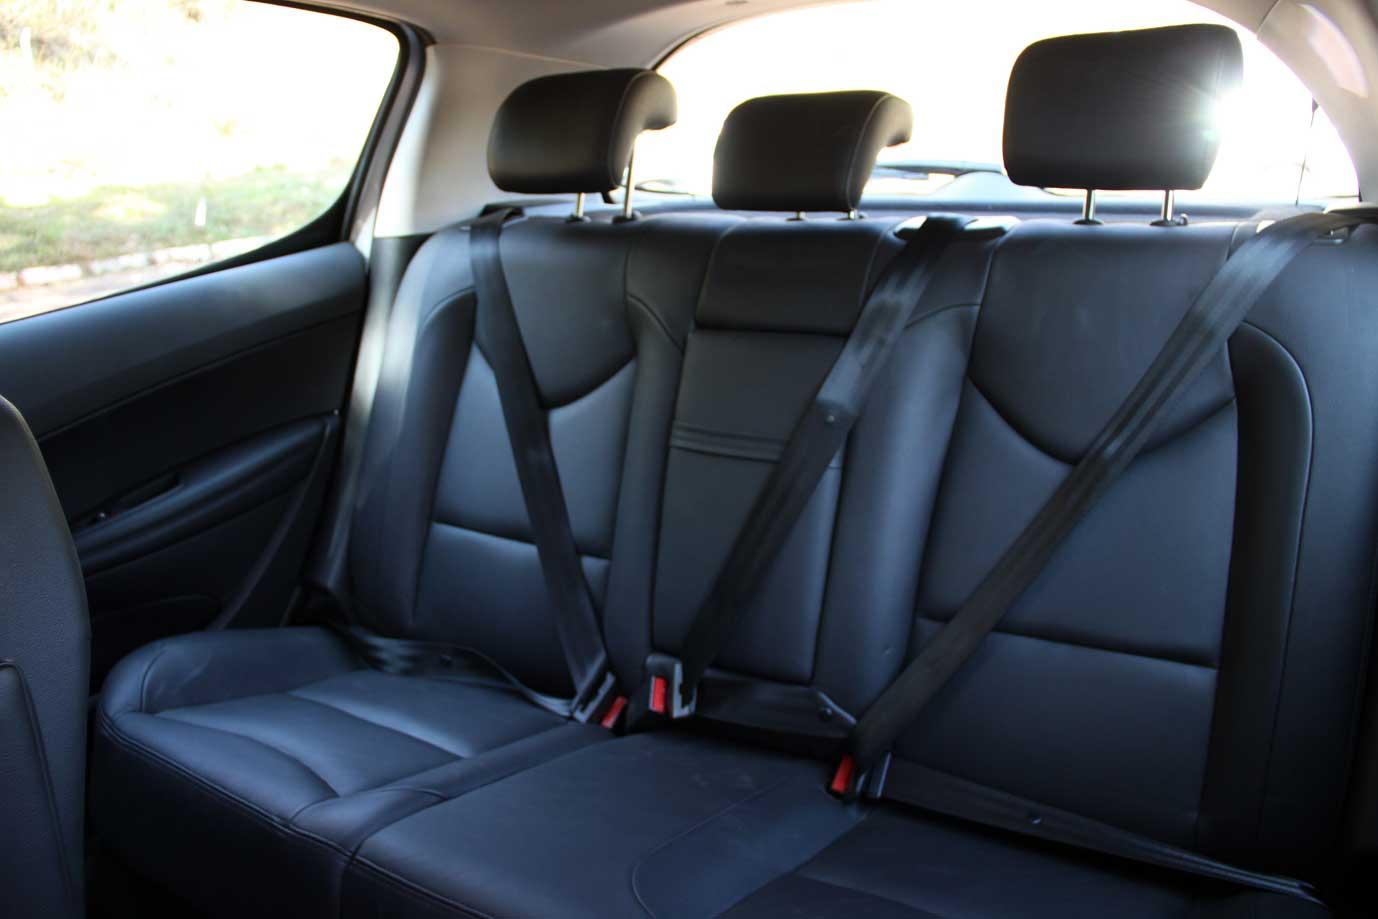 Peugeot 308 Fotos Interior Asientos